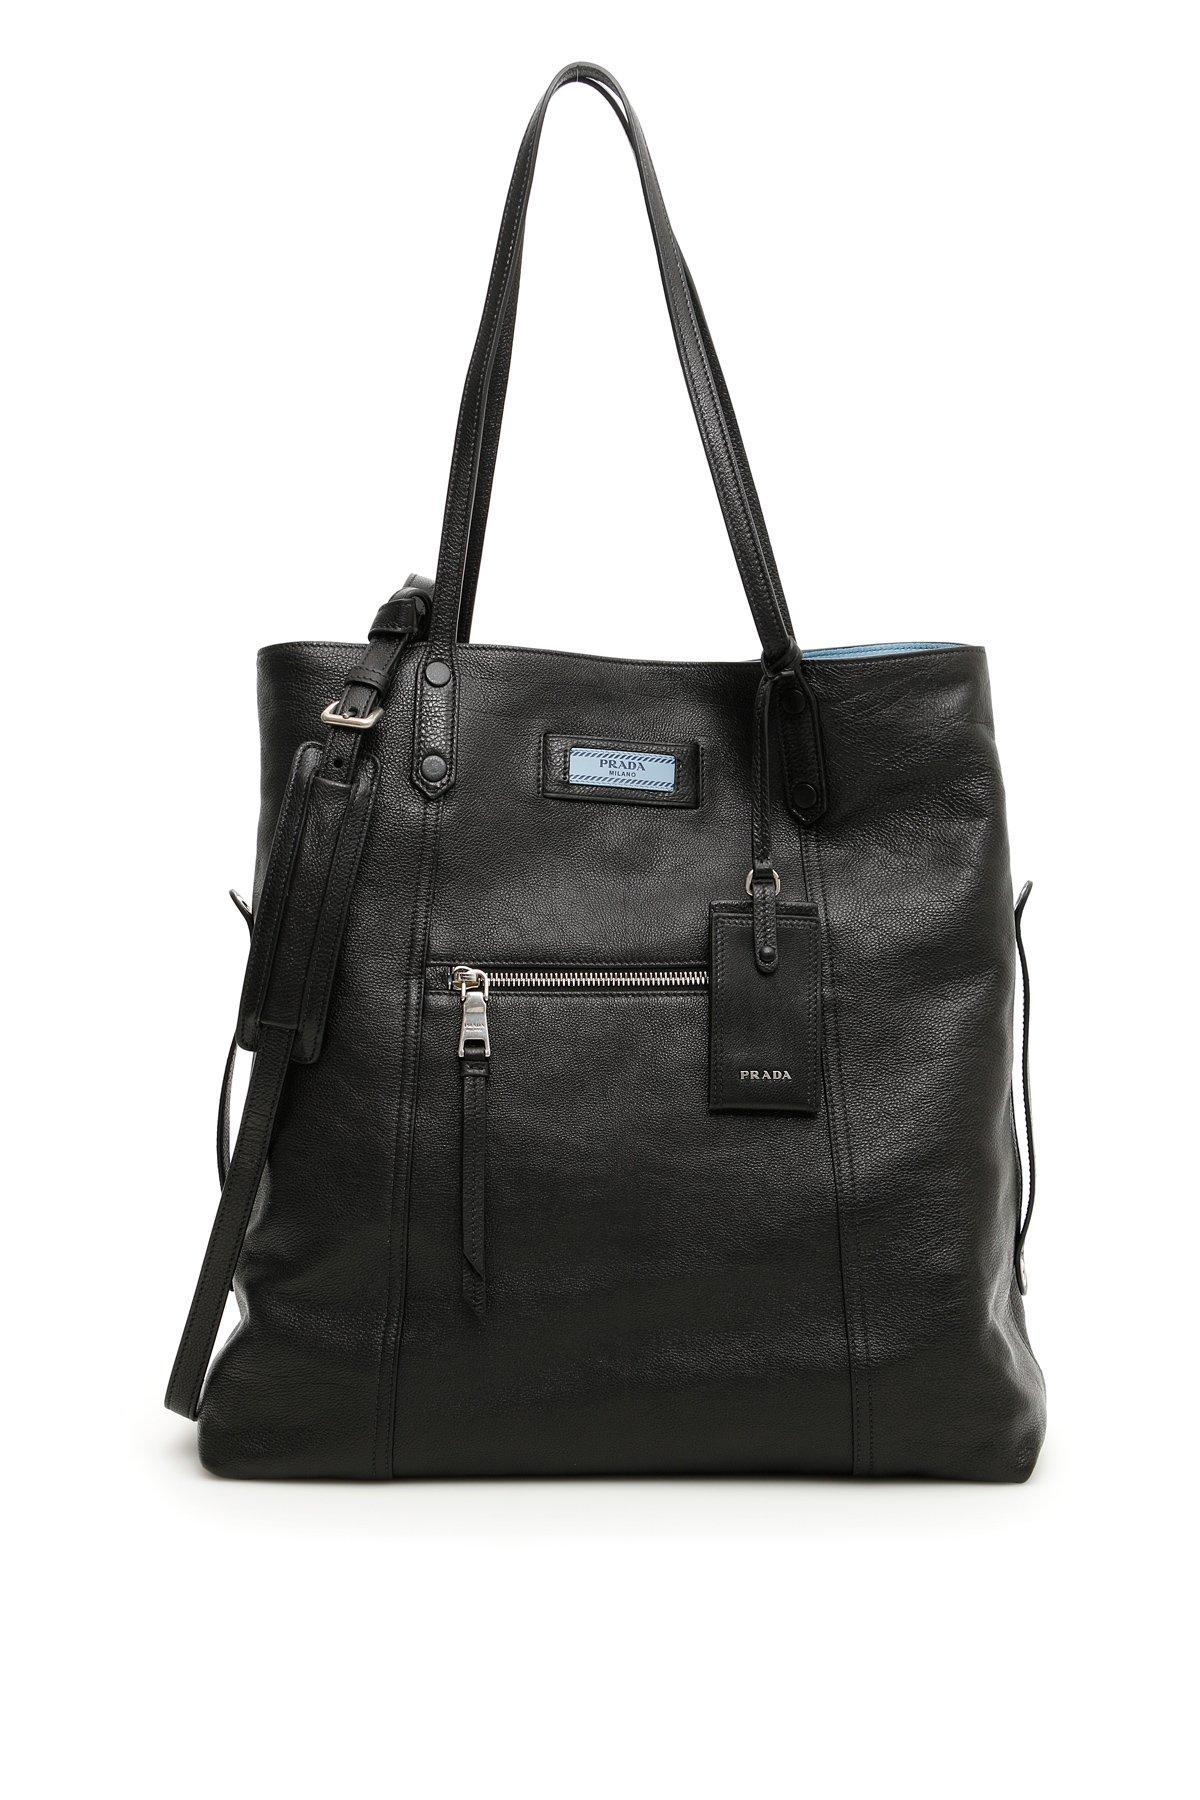 9845f6fb974d Prada Etiquette Large Leather Tote In Black   ModeSens